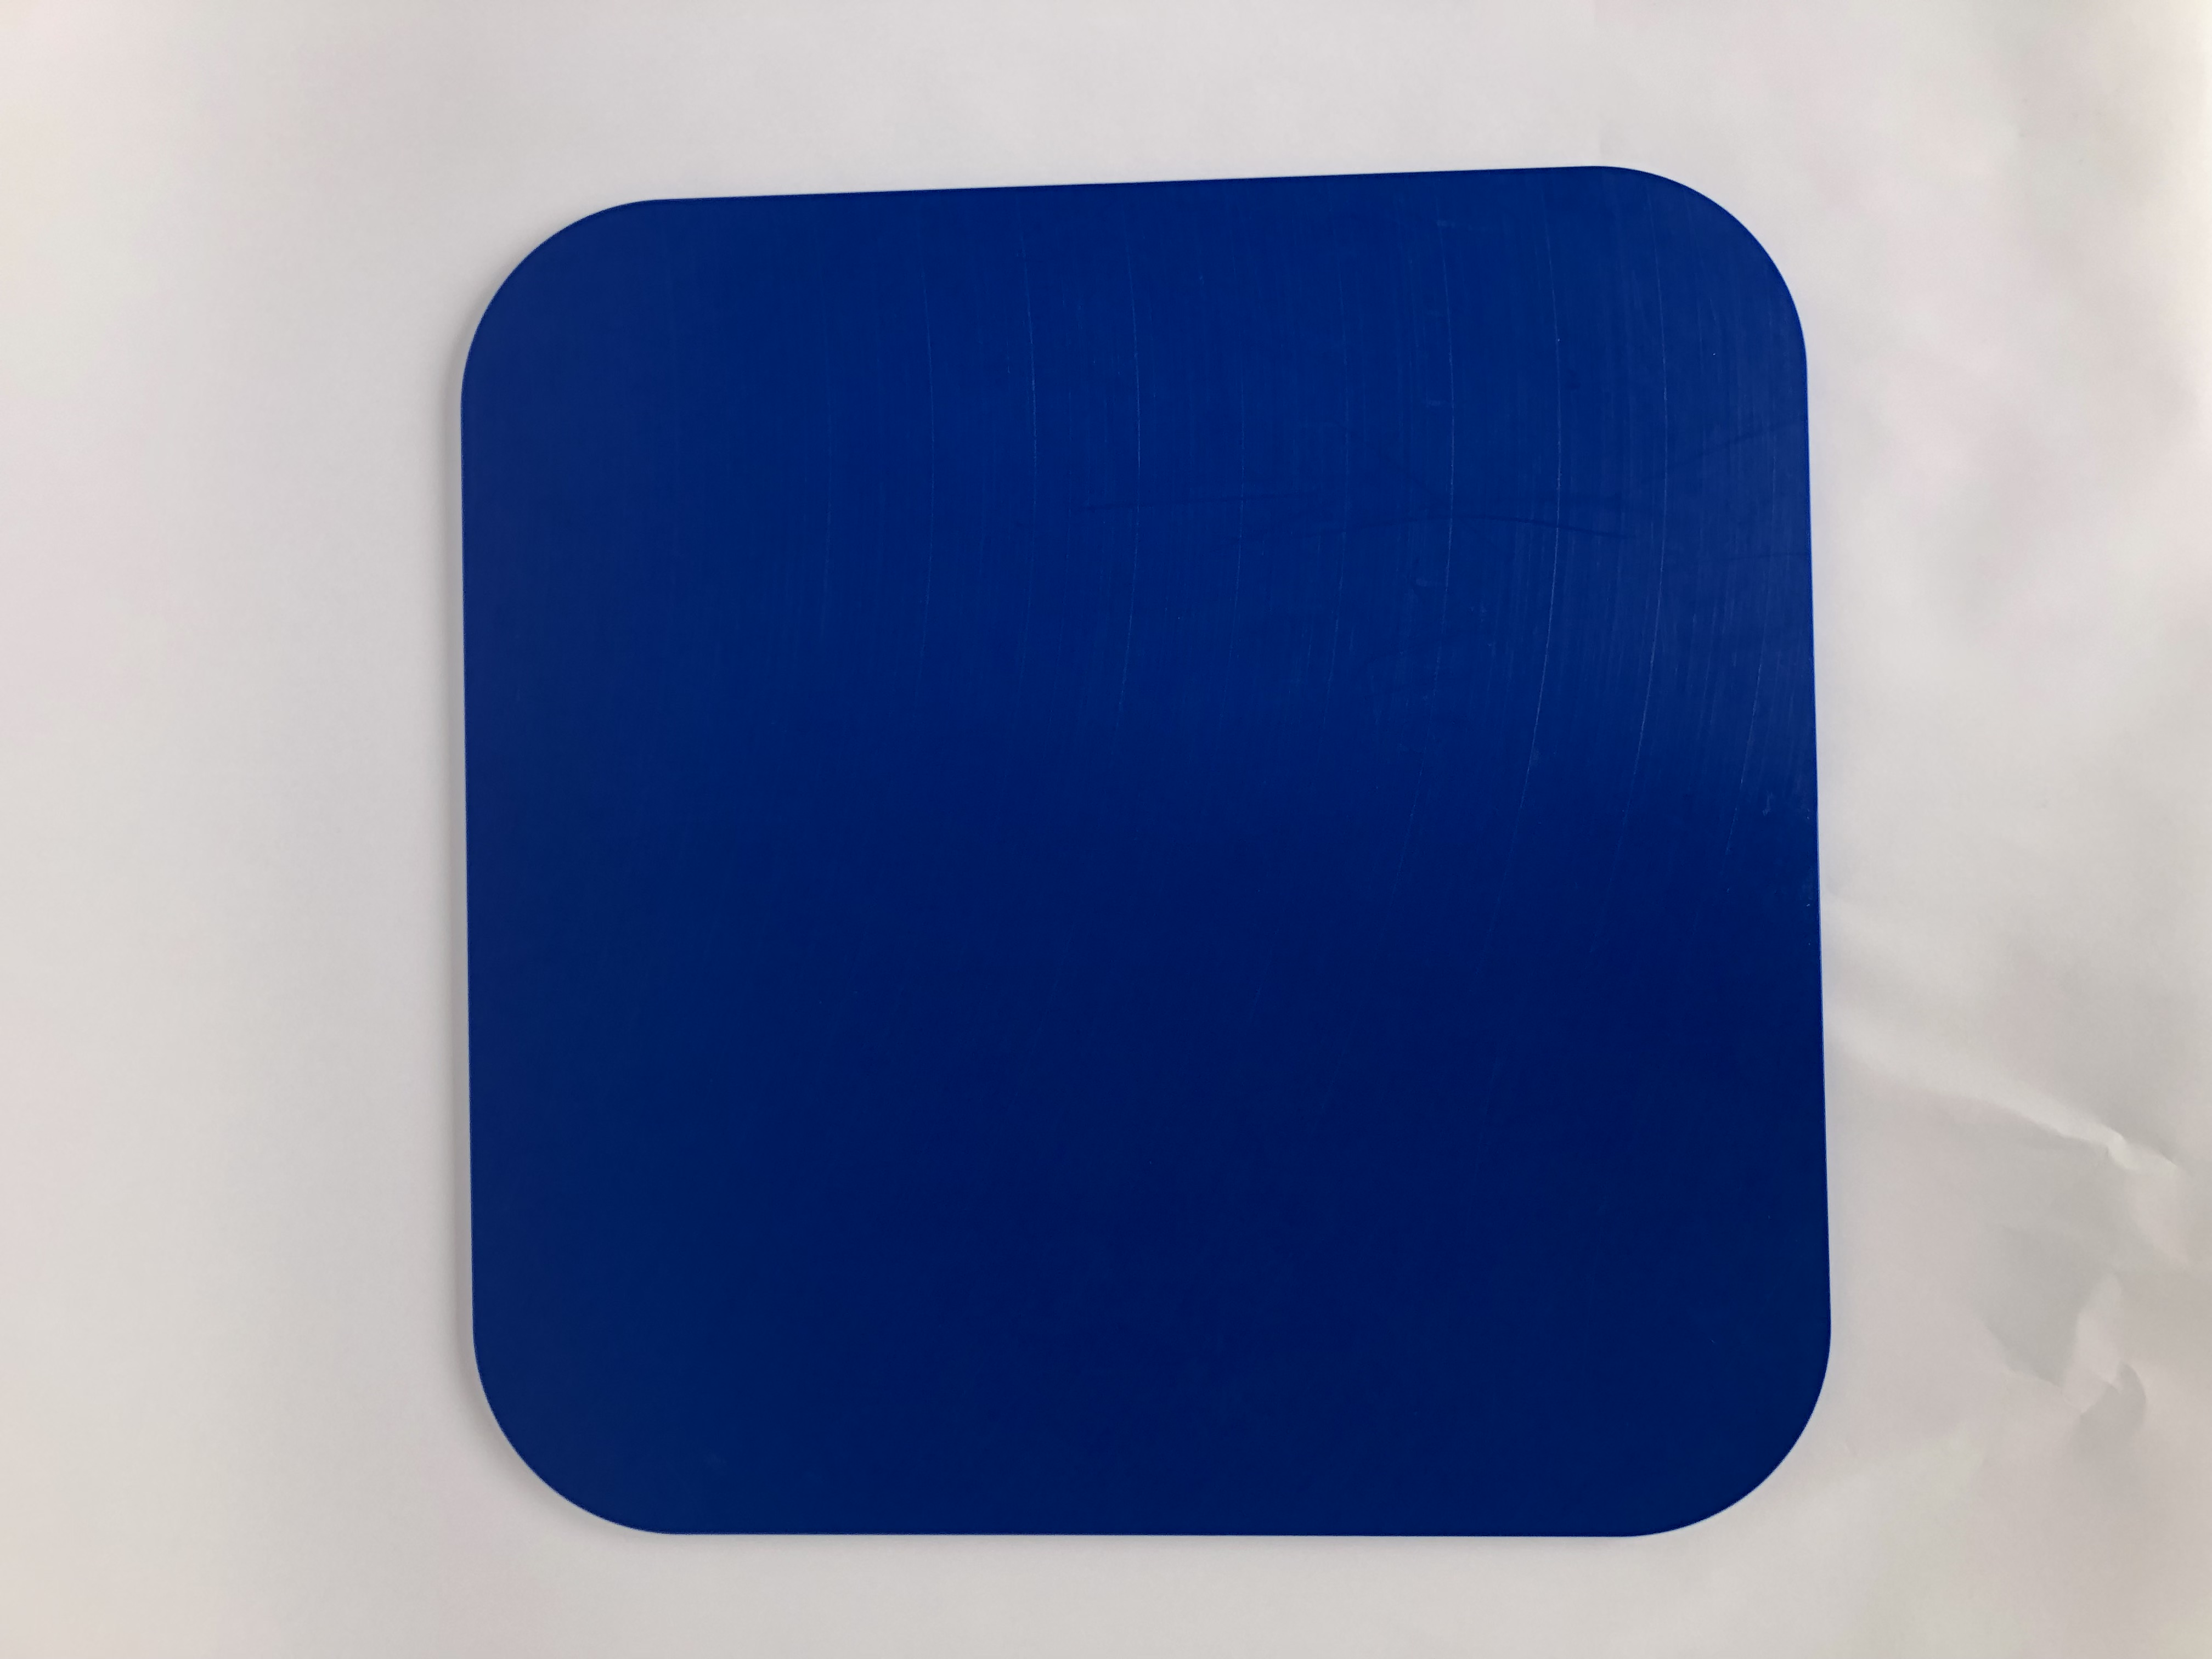 Kunststoffplatte detektierbar